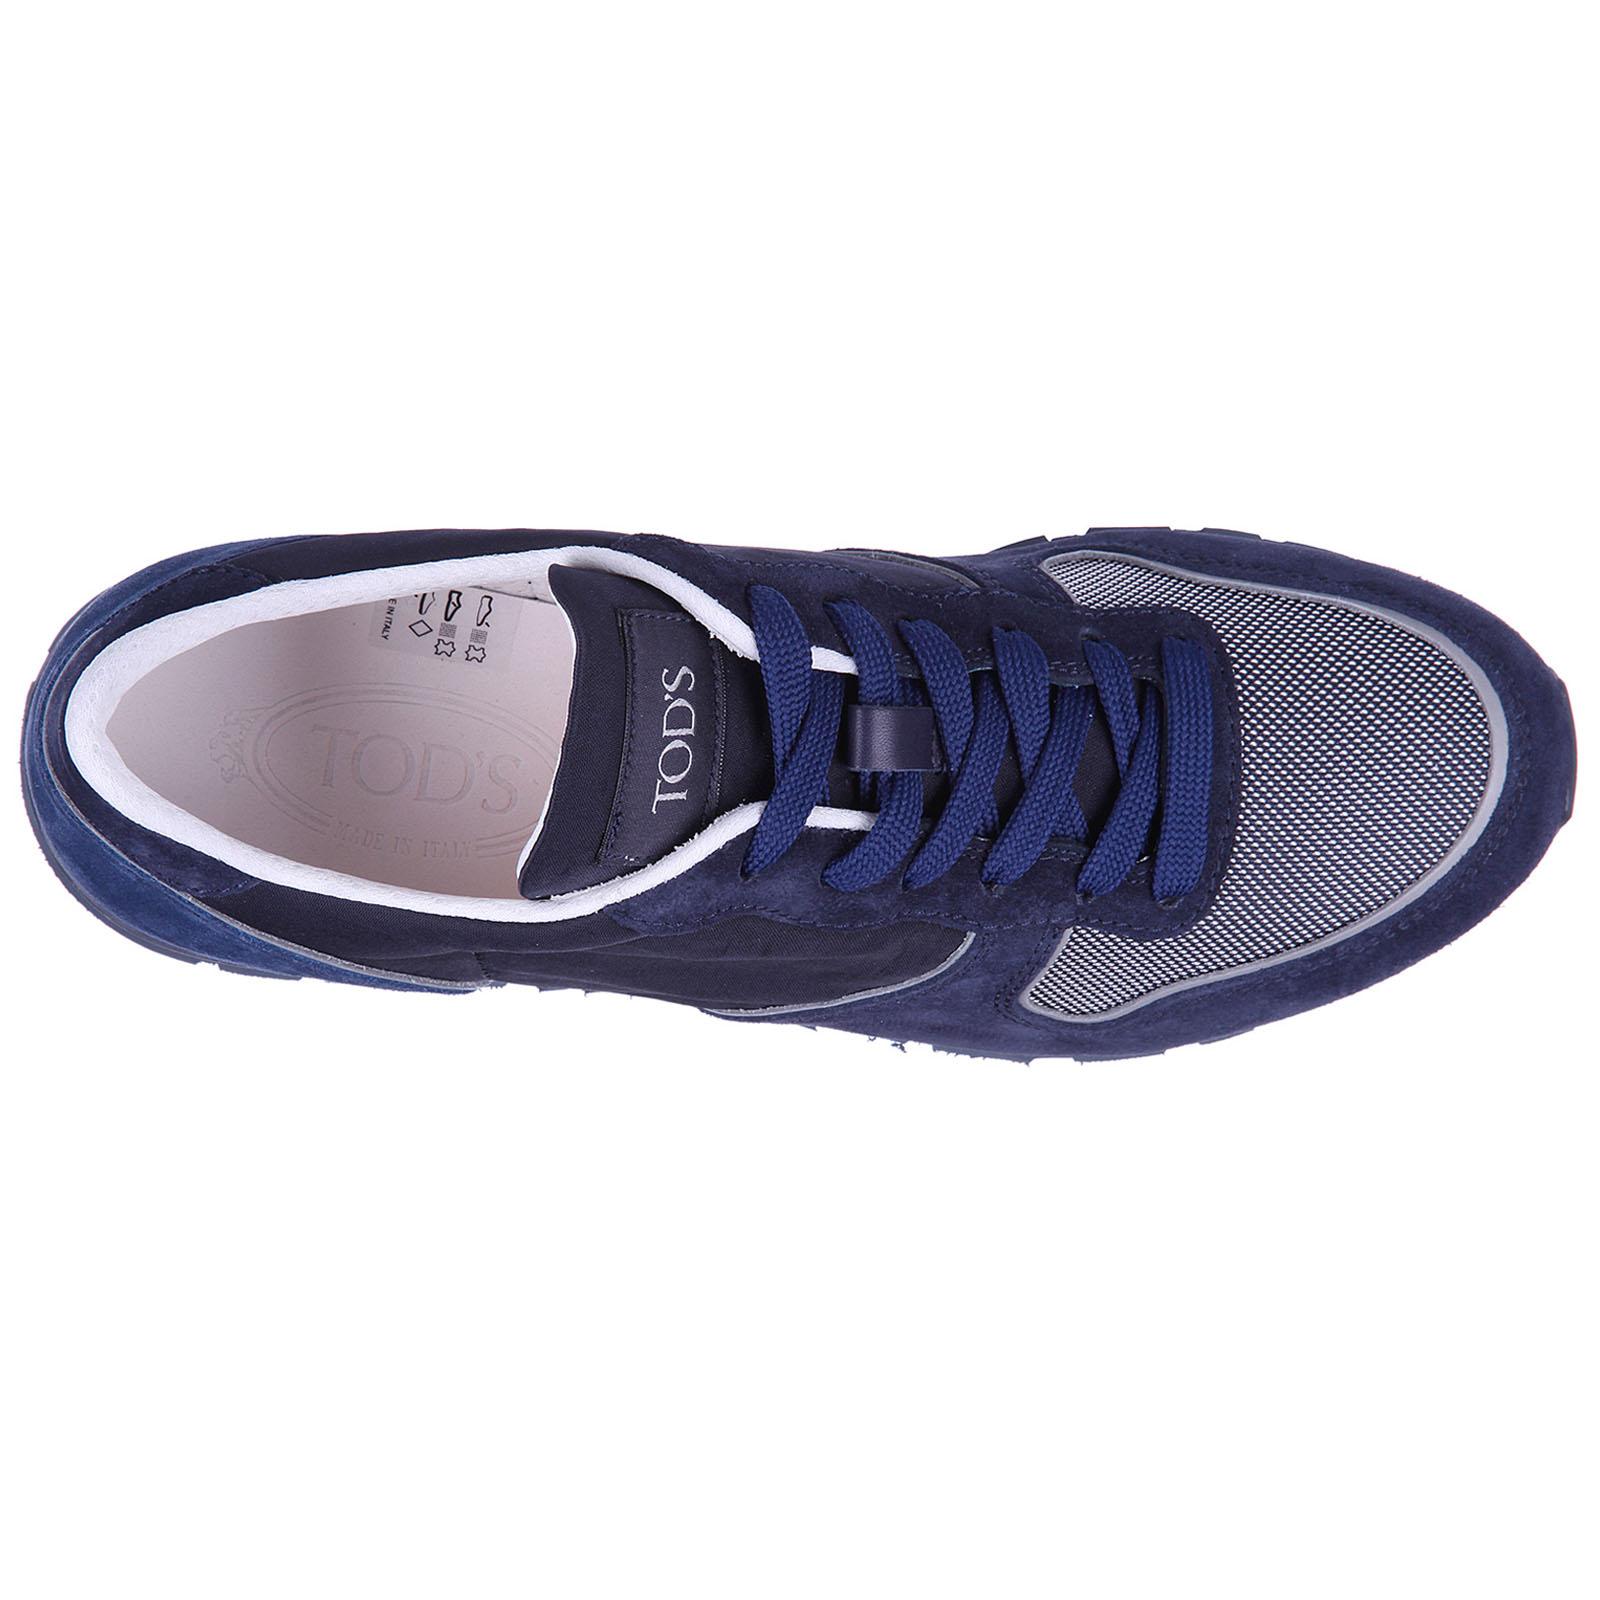 Tod's Xxm0ym0l810cgw54fr Blu Sneakers Sneakers Xxm0ym0l810cgw54fr Tod's qBB5Pwp0